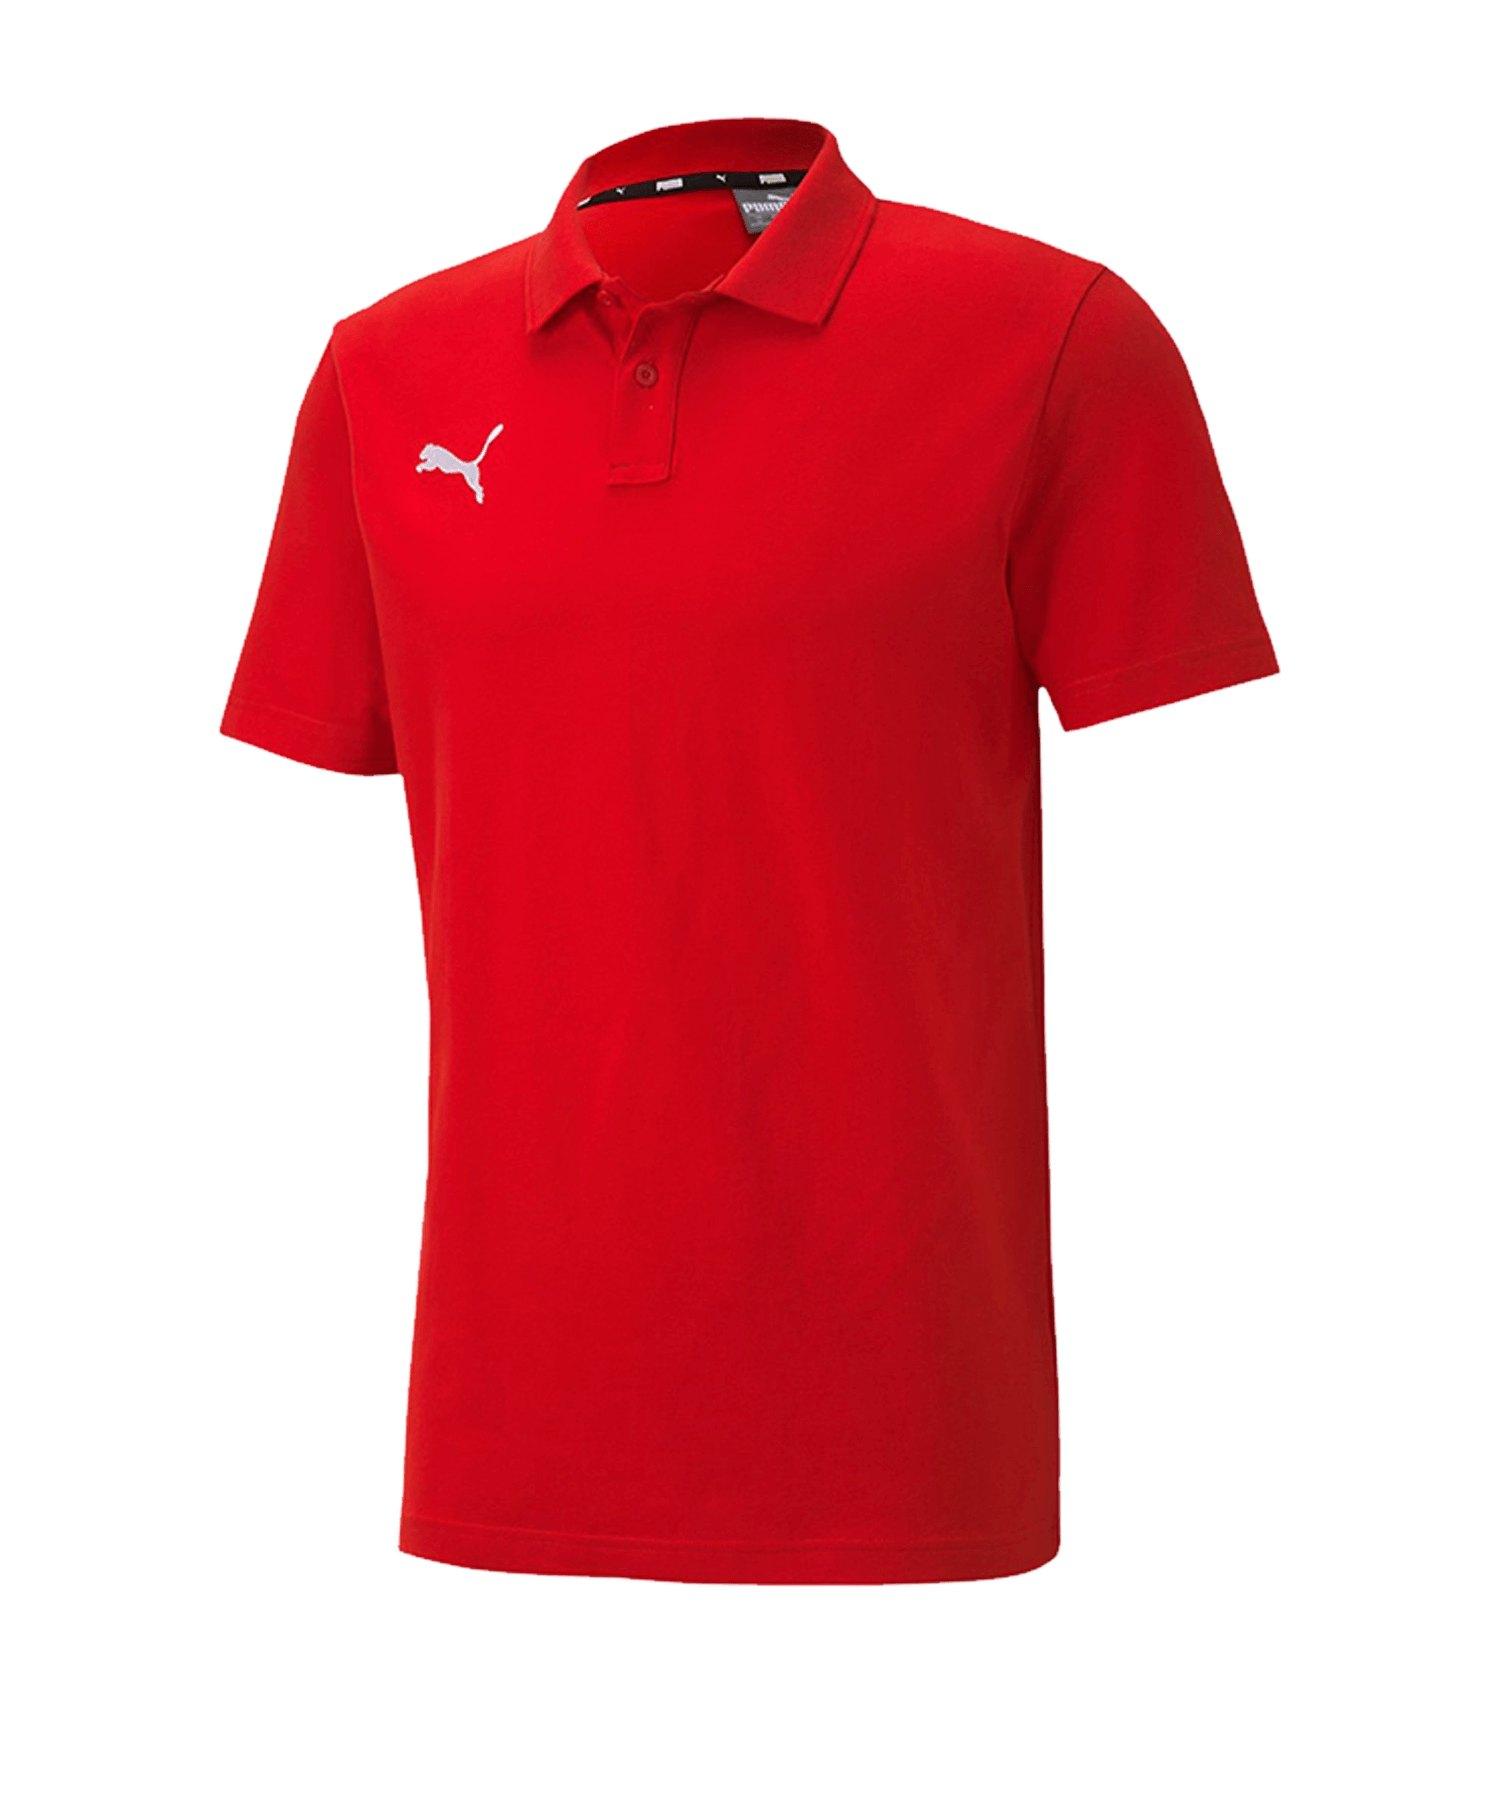 PUMA teamGOAL 23 Casuals Poloshirt Rot F01 - rot